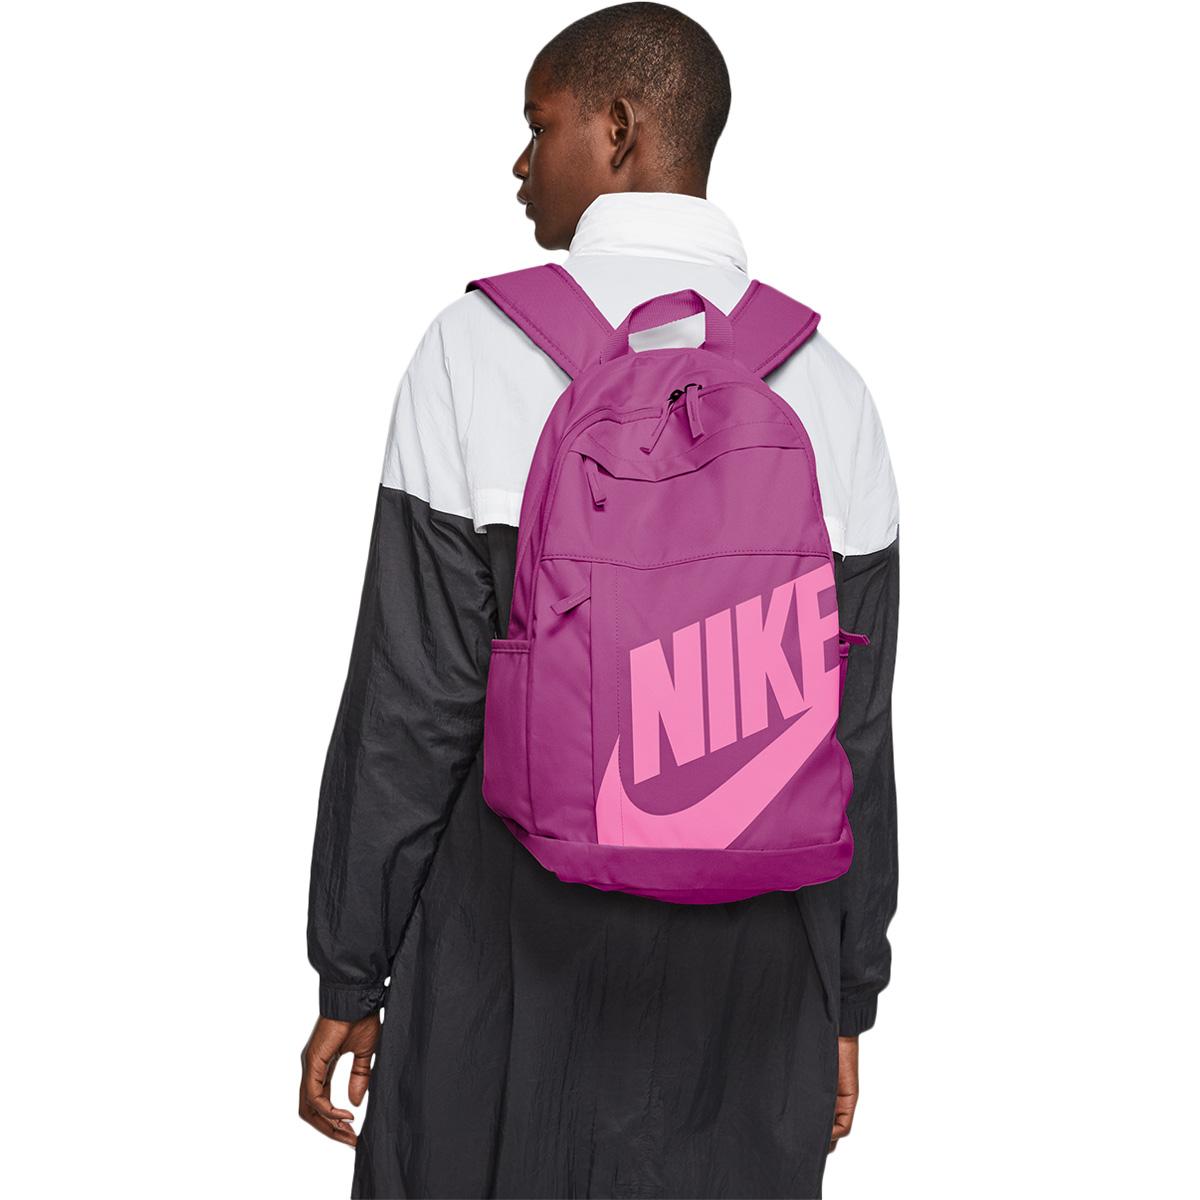 Nike Elemental 2.0 Rygsæk